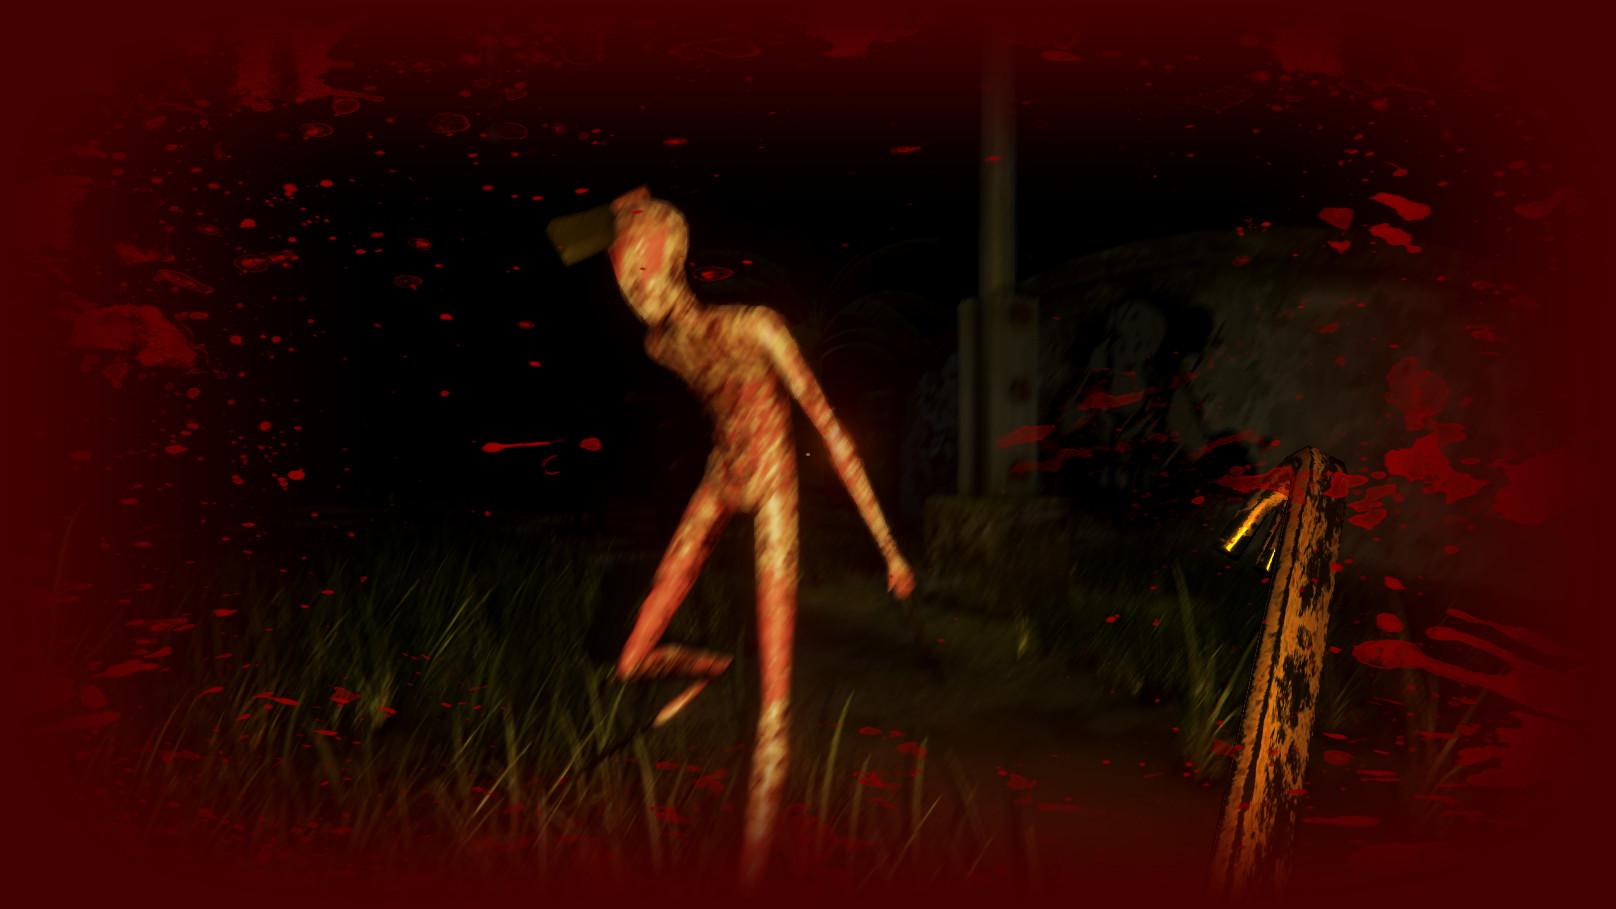 pulang-insanity-directors-cut-pc-screenshot-03